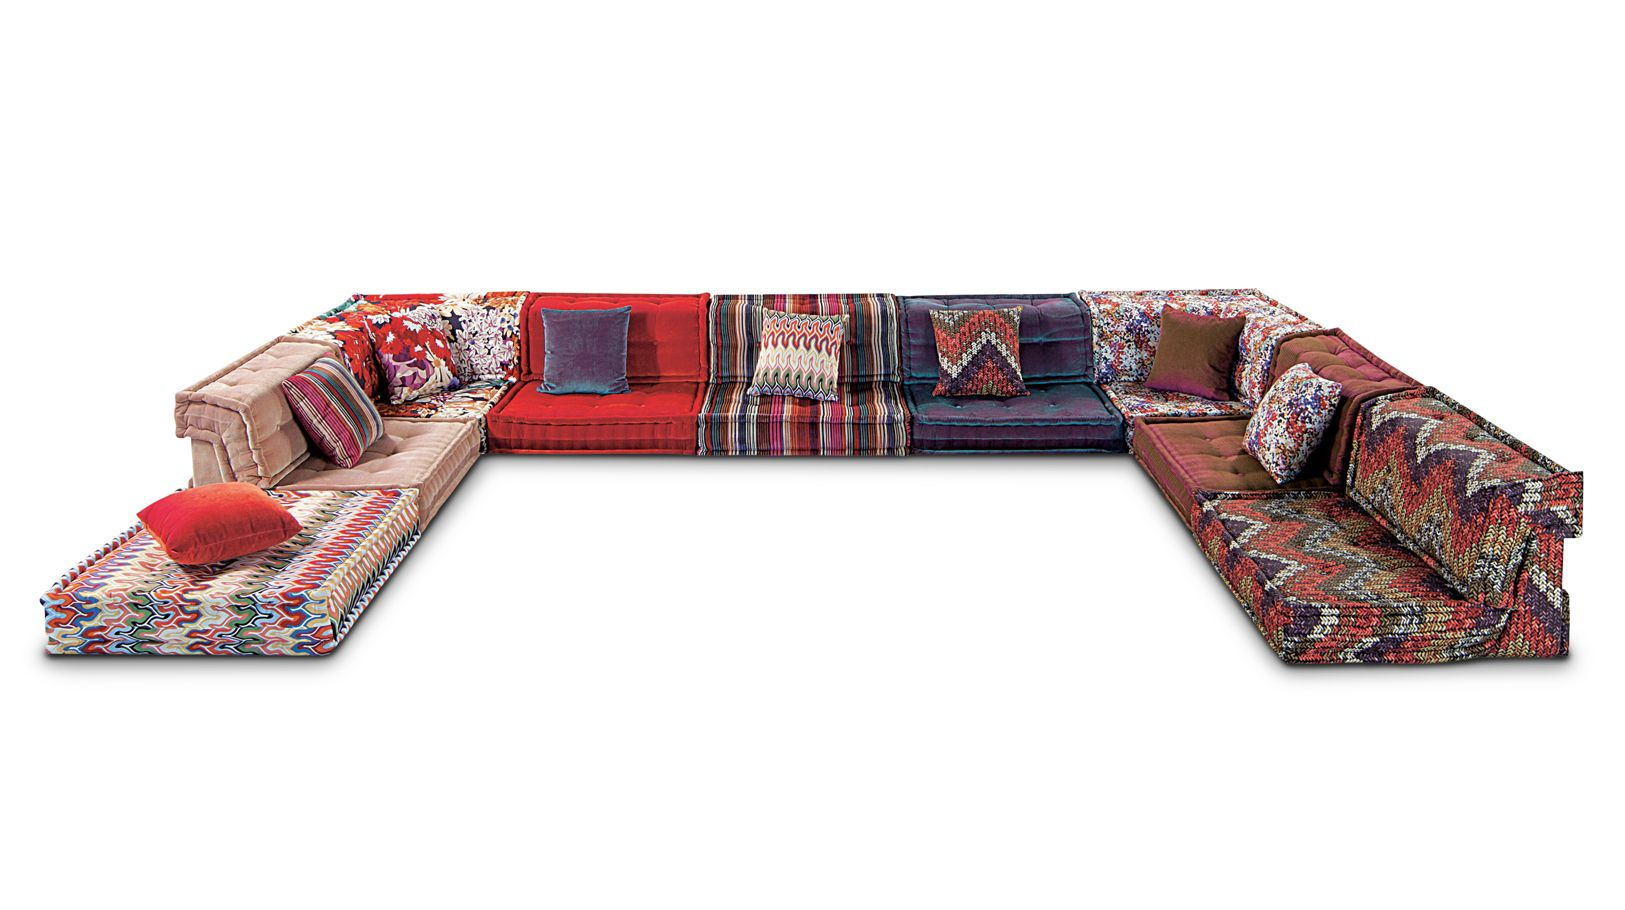 composition missoni home mah jong roche bobois. Black Bedroom Furniture Sets. Home Design Ideas